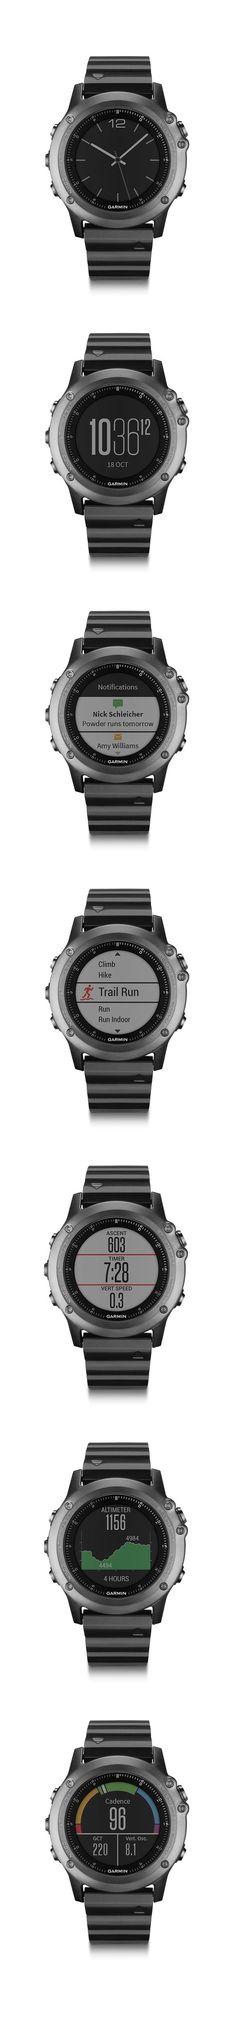 Fenix 3 Sapphire. World's first adventure sport training Garmin GPS/GLONASS watch. #Fenix3: